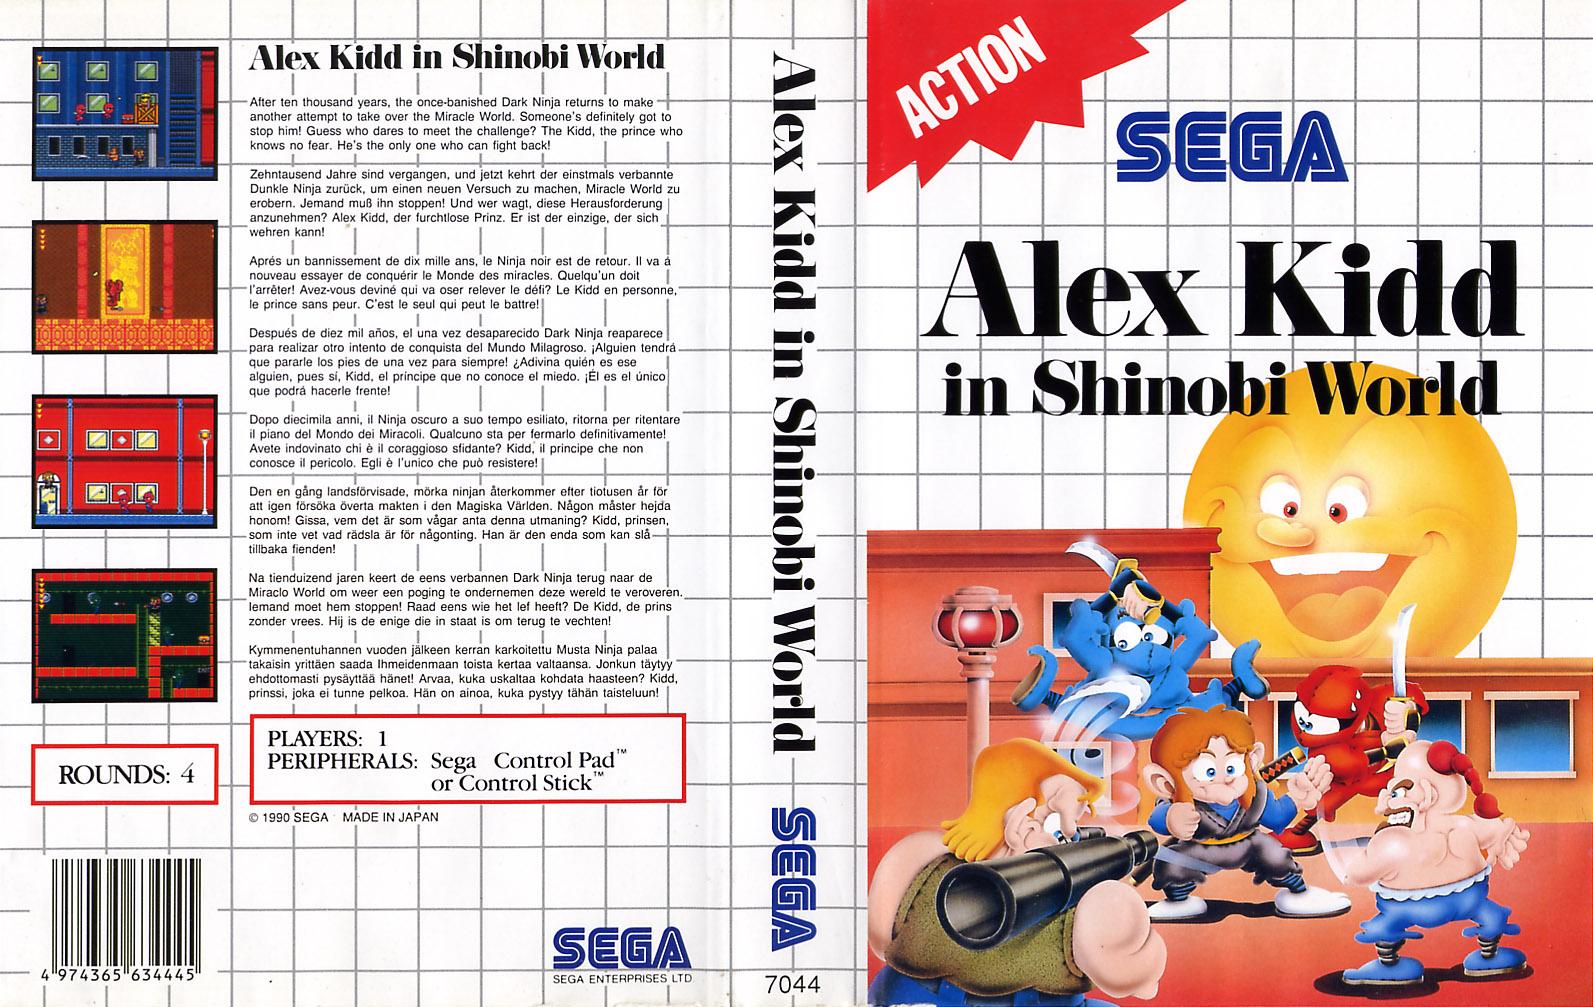 [Série] Alex Kidd - Master System & Mega Drive AlexKiddInShinobiWorld-SMS-EU